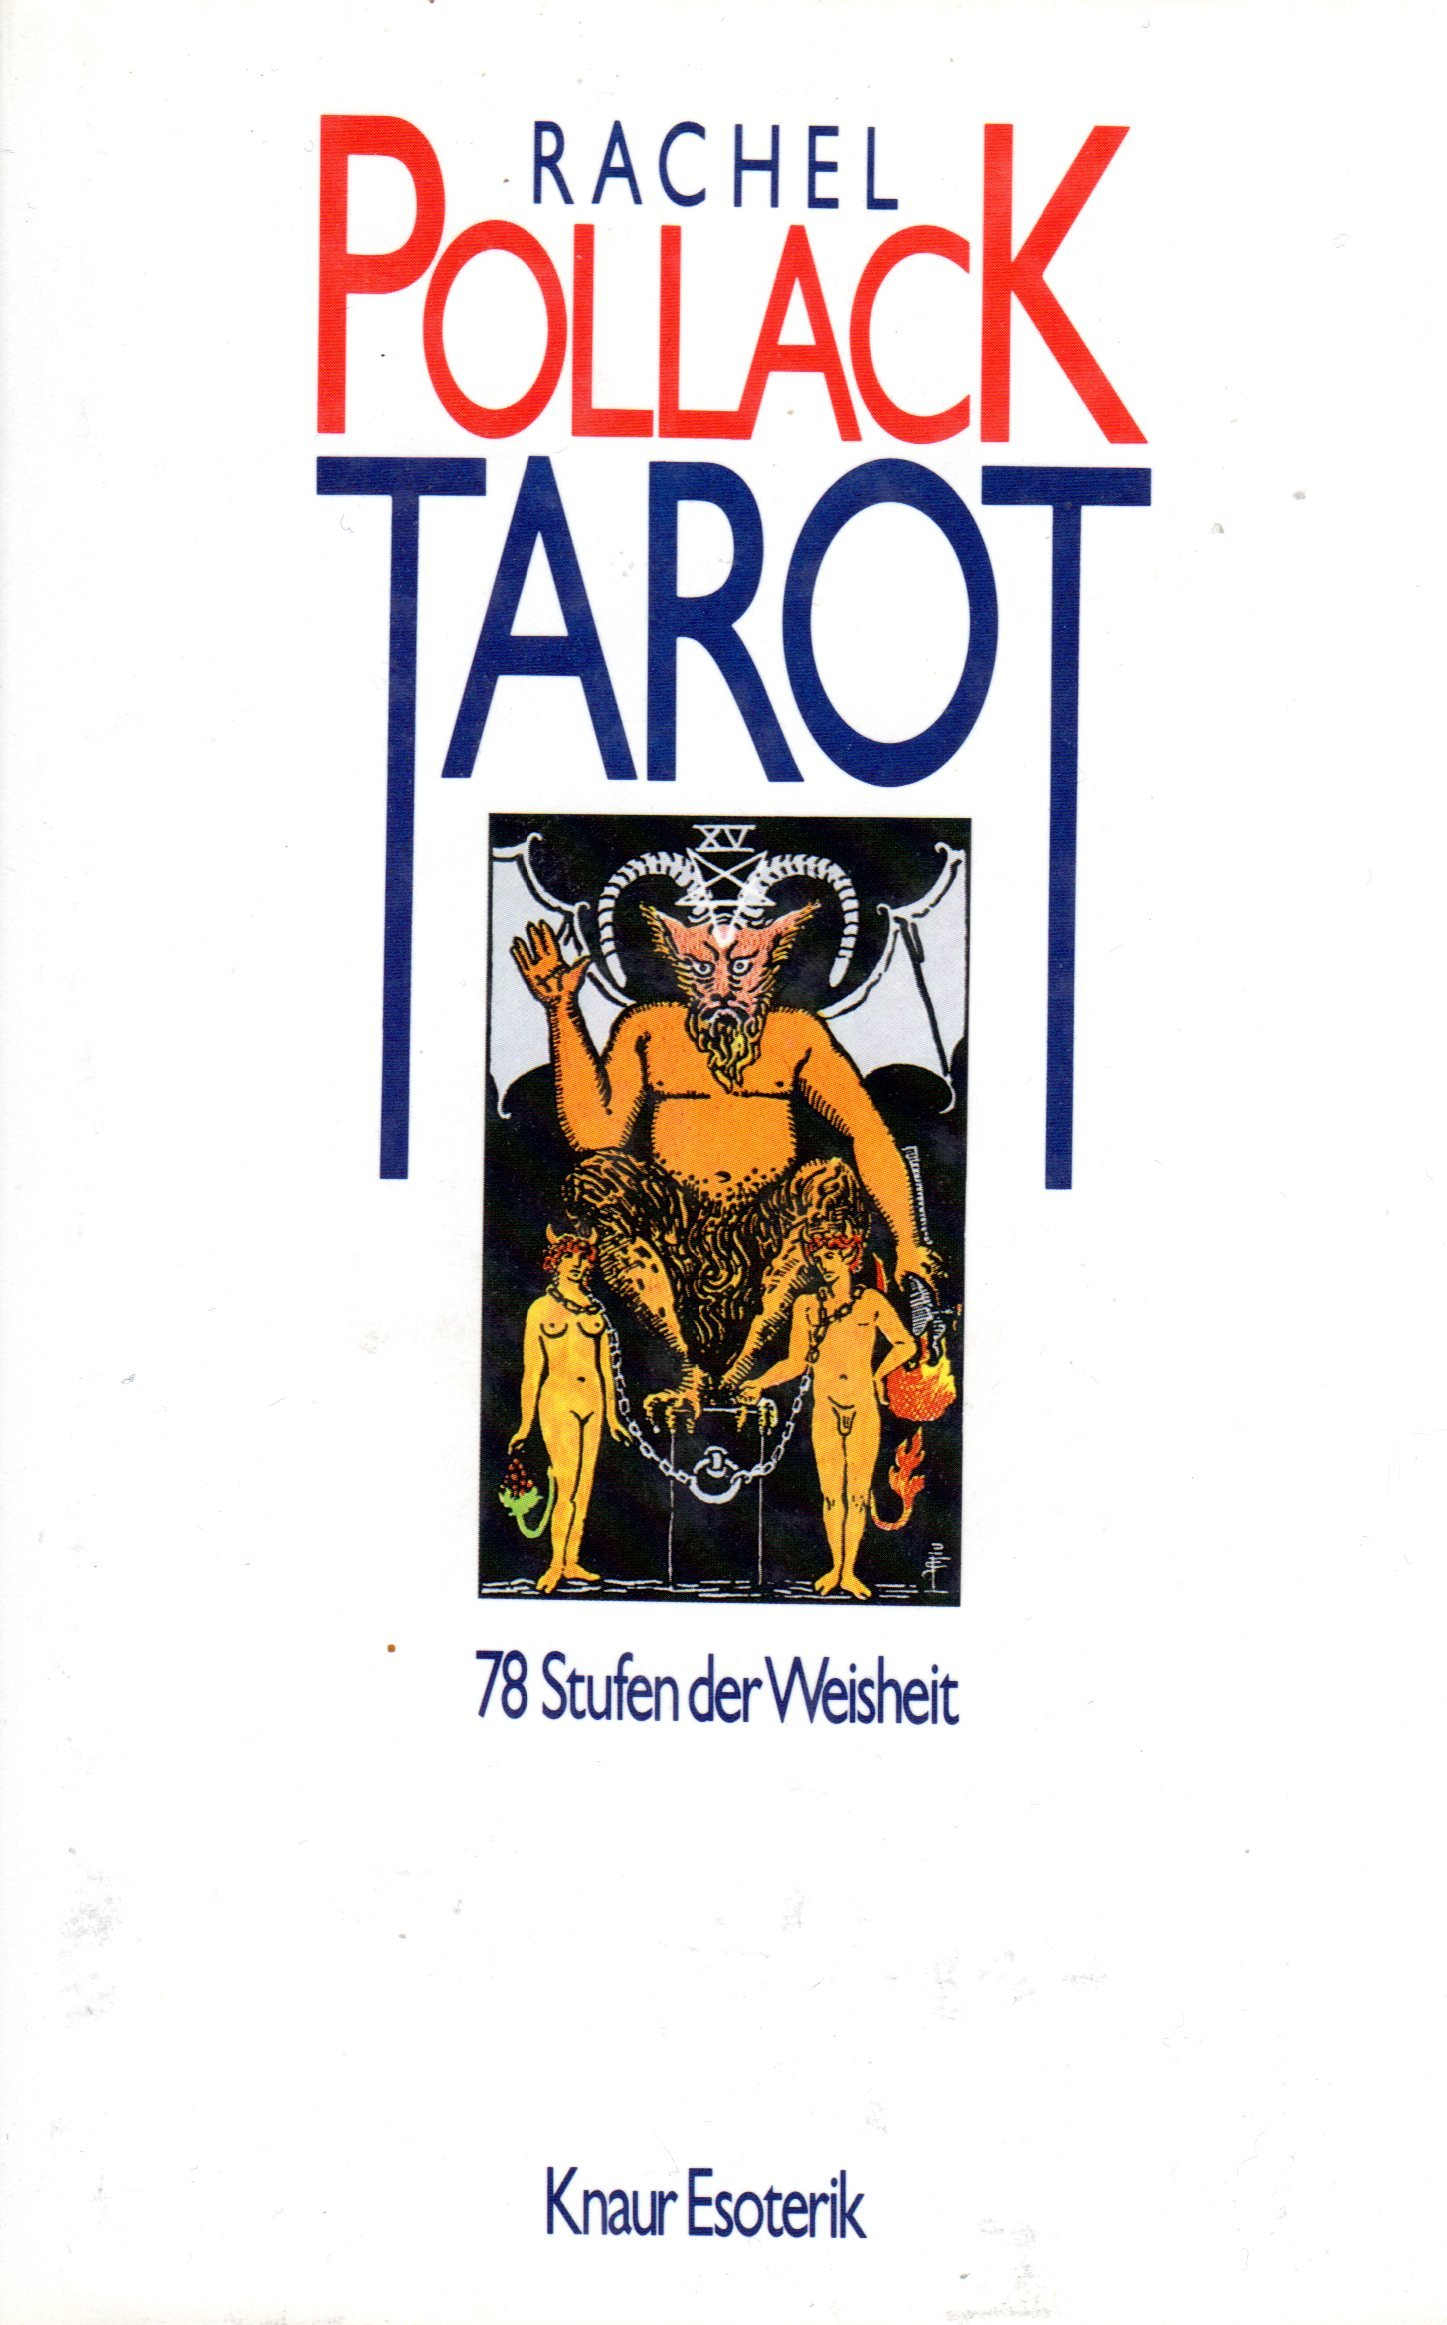 Tarot. 78 Stufen der Weisheit Gebundenes Buch – 1987 Rachel Pollack Droemer Knaur 3426263203 Lebensdeutung